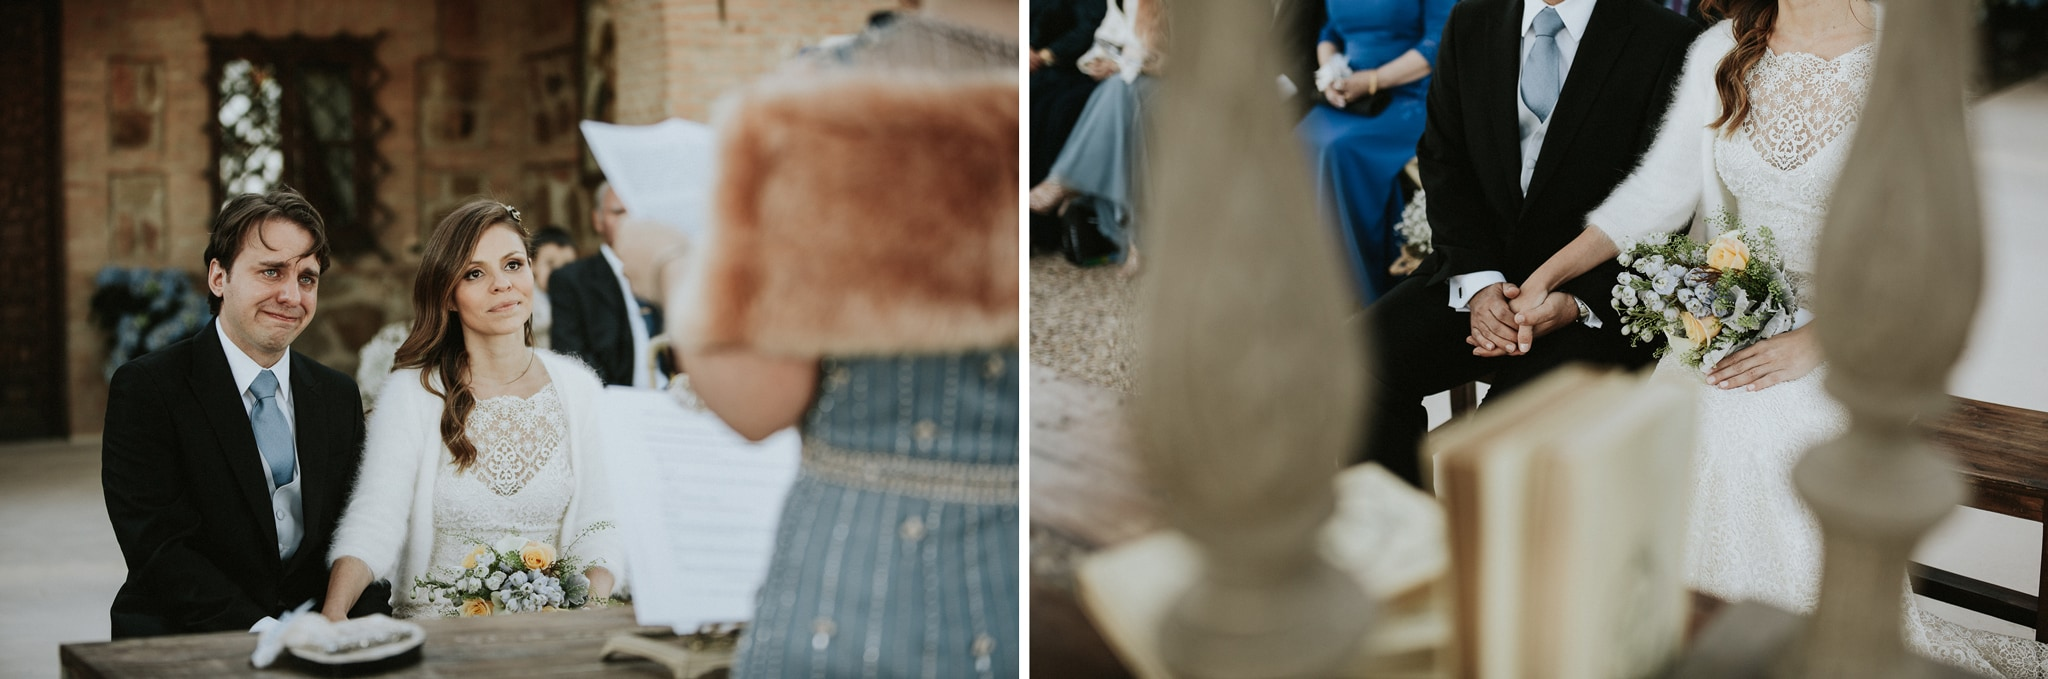 Fotografo-bodas-Cigarral-de-las-Mercedes-74